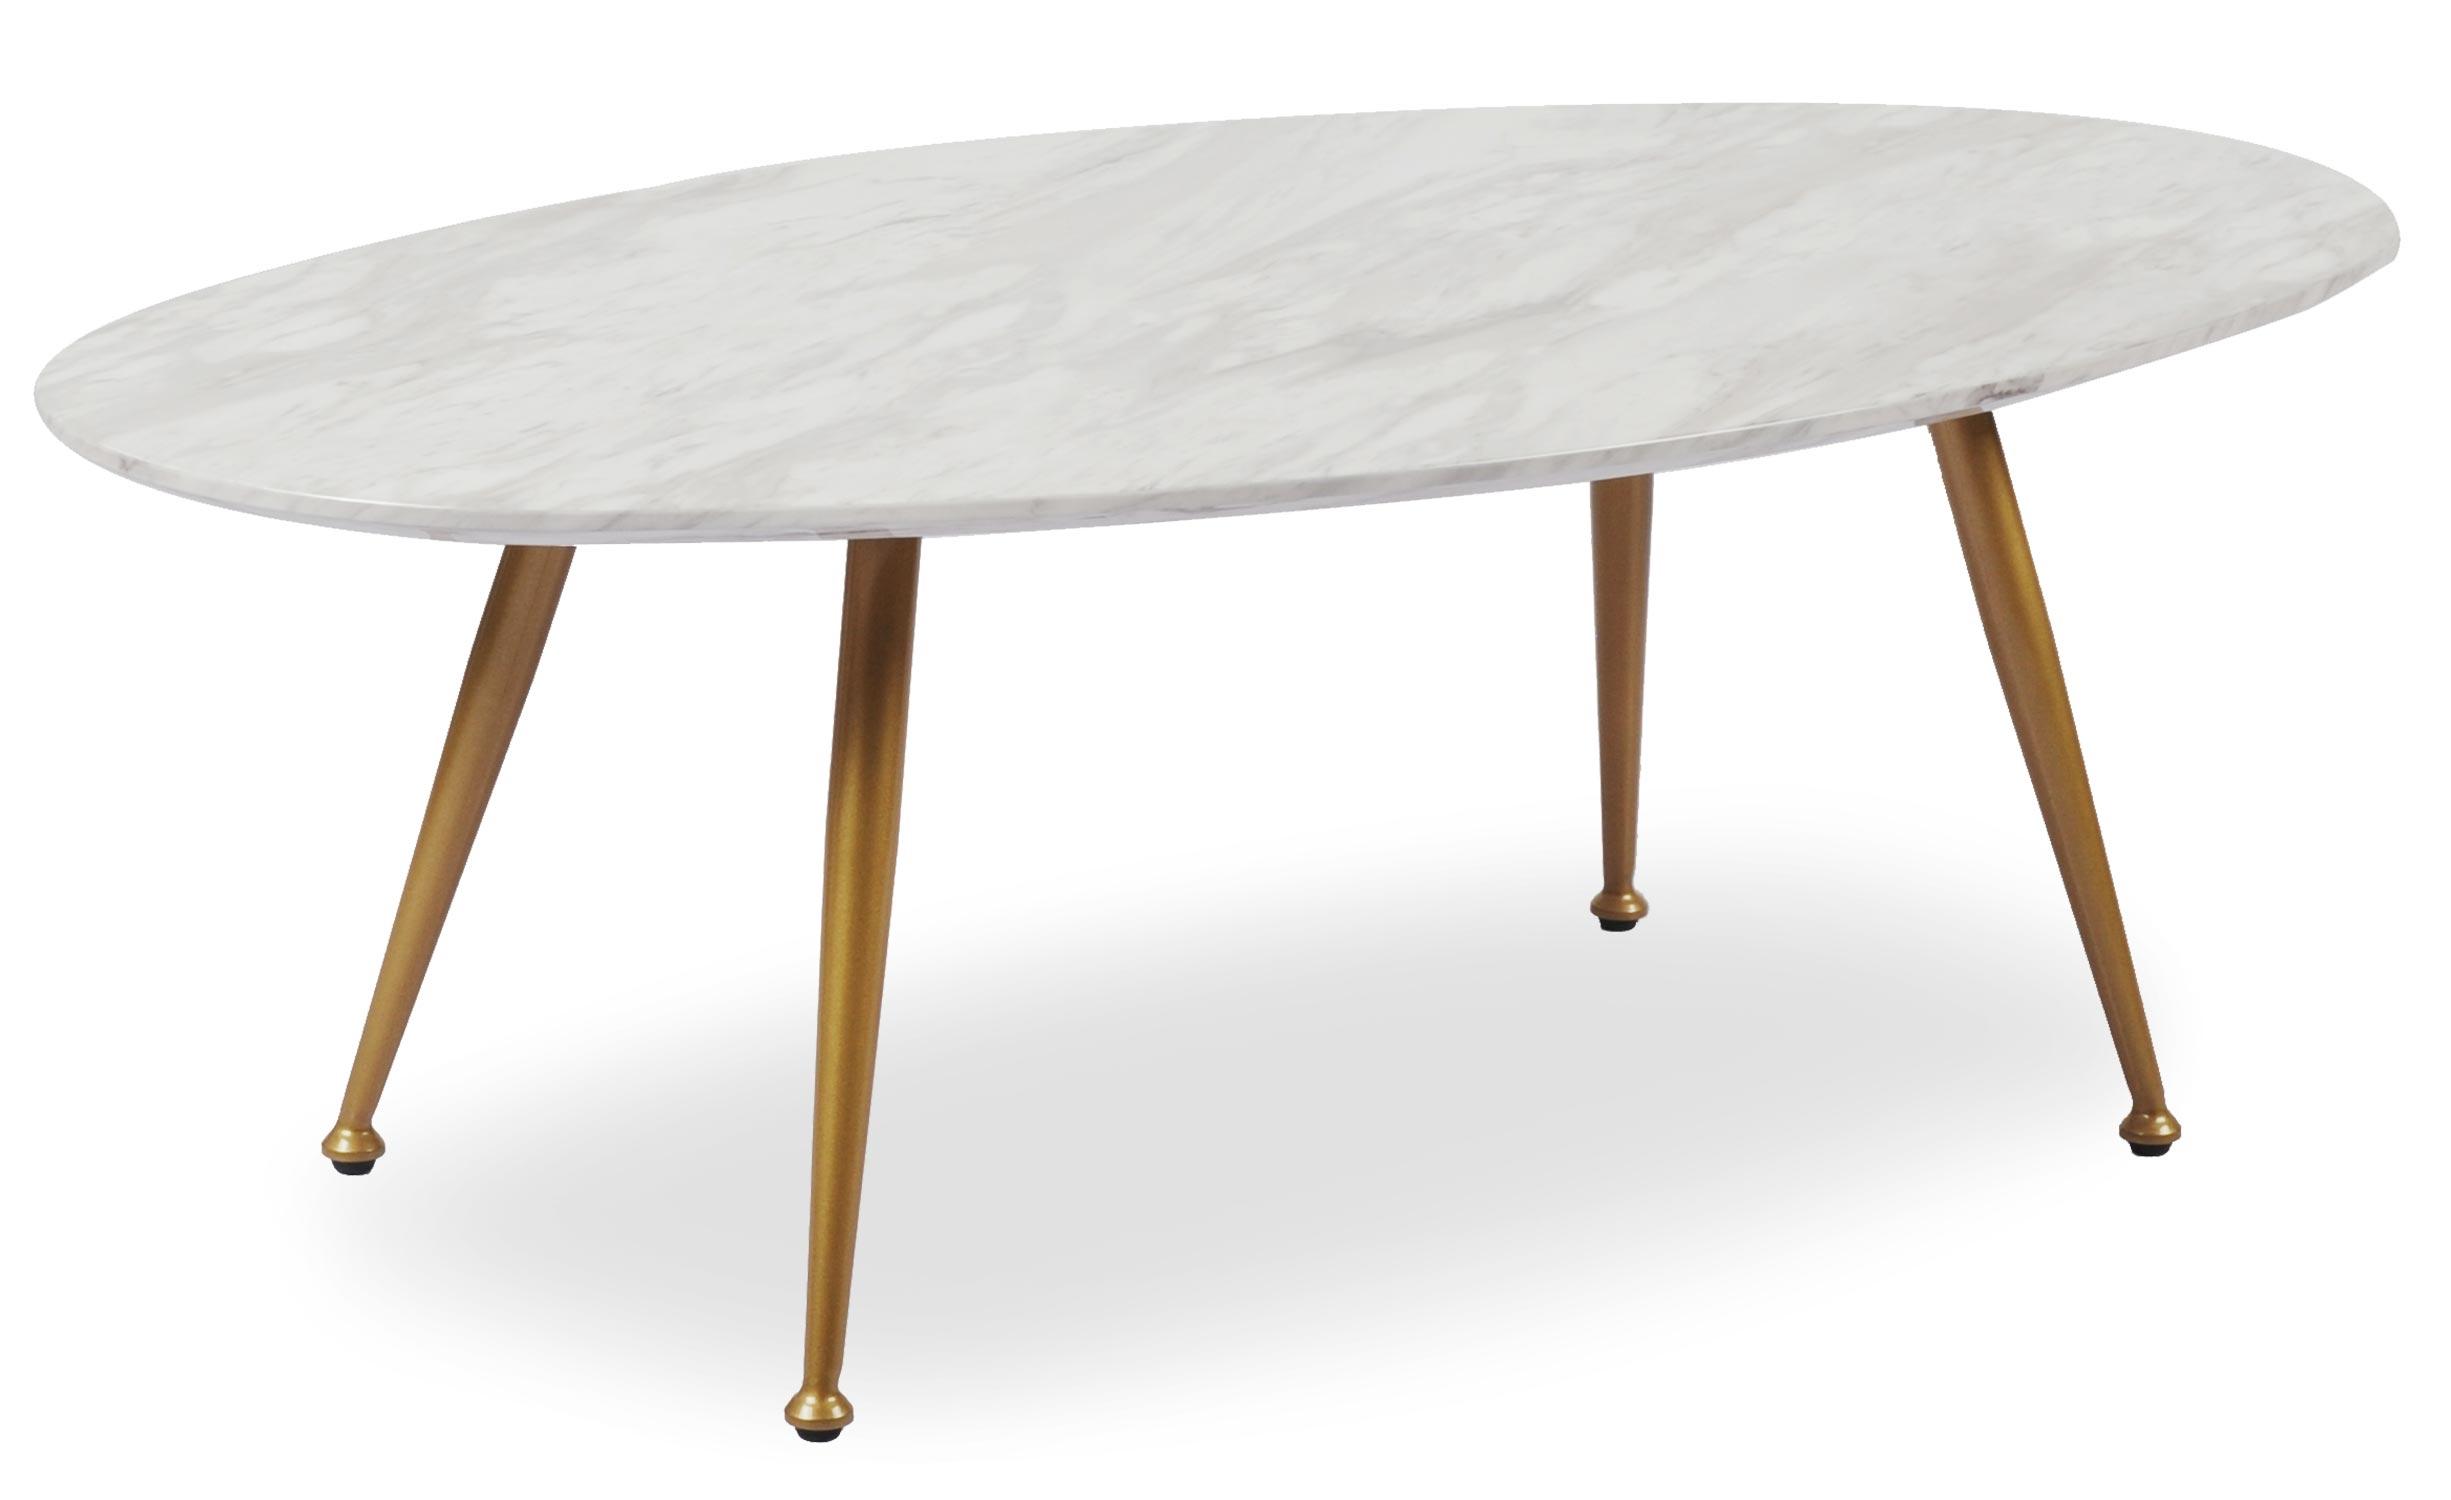 Table basse ovale Romy Effet Marbre